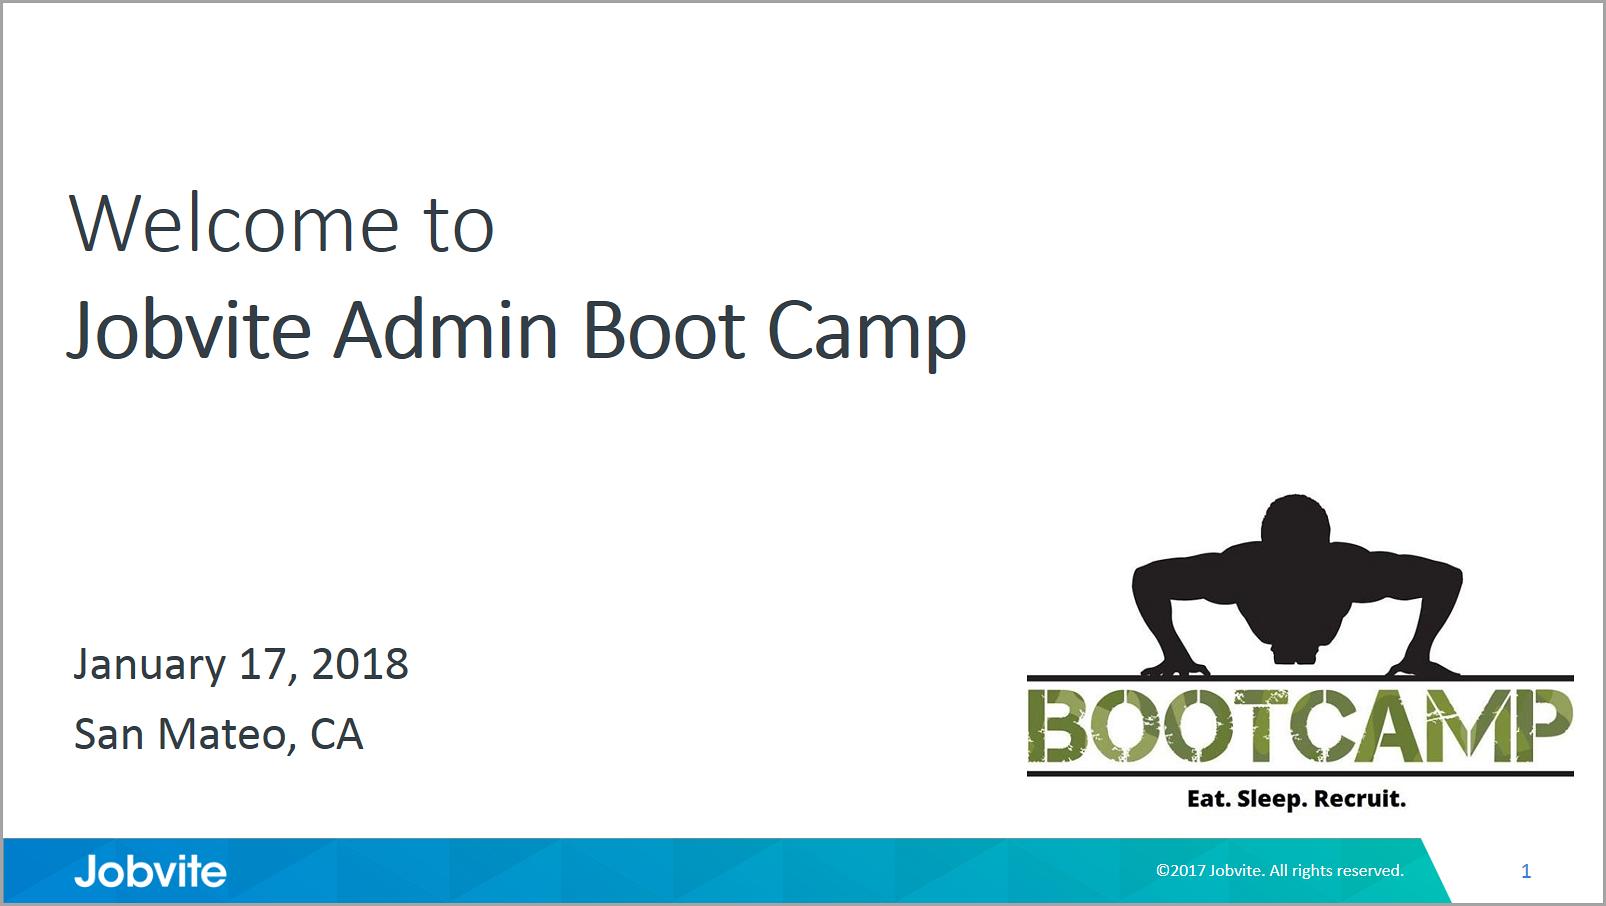 Jobvite Hire Boot Camp for Administrators, January 17, 2018, San Mateo, CA